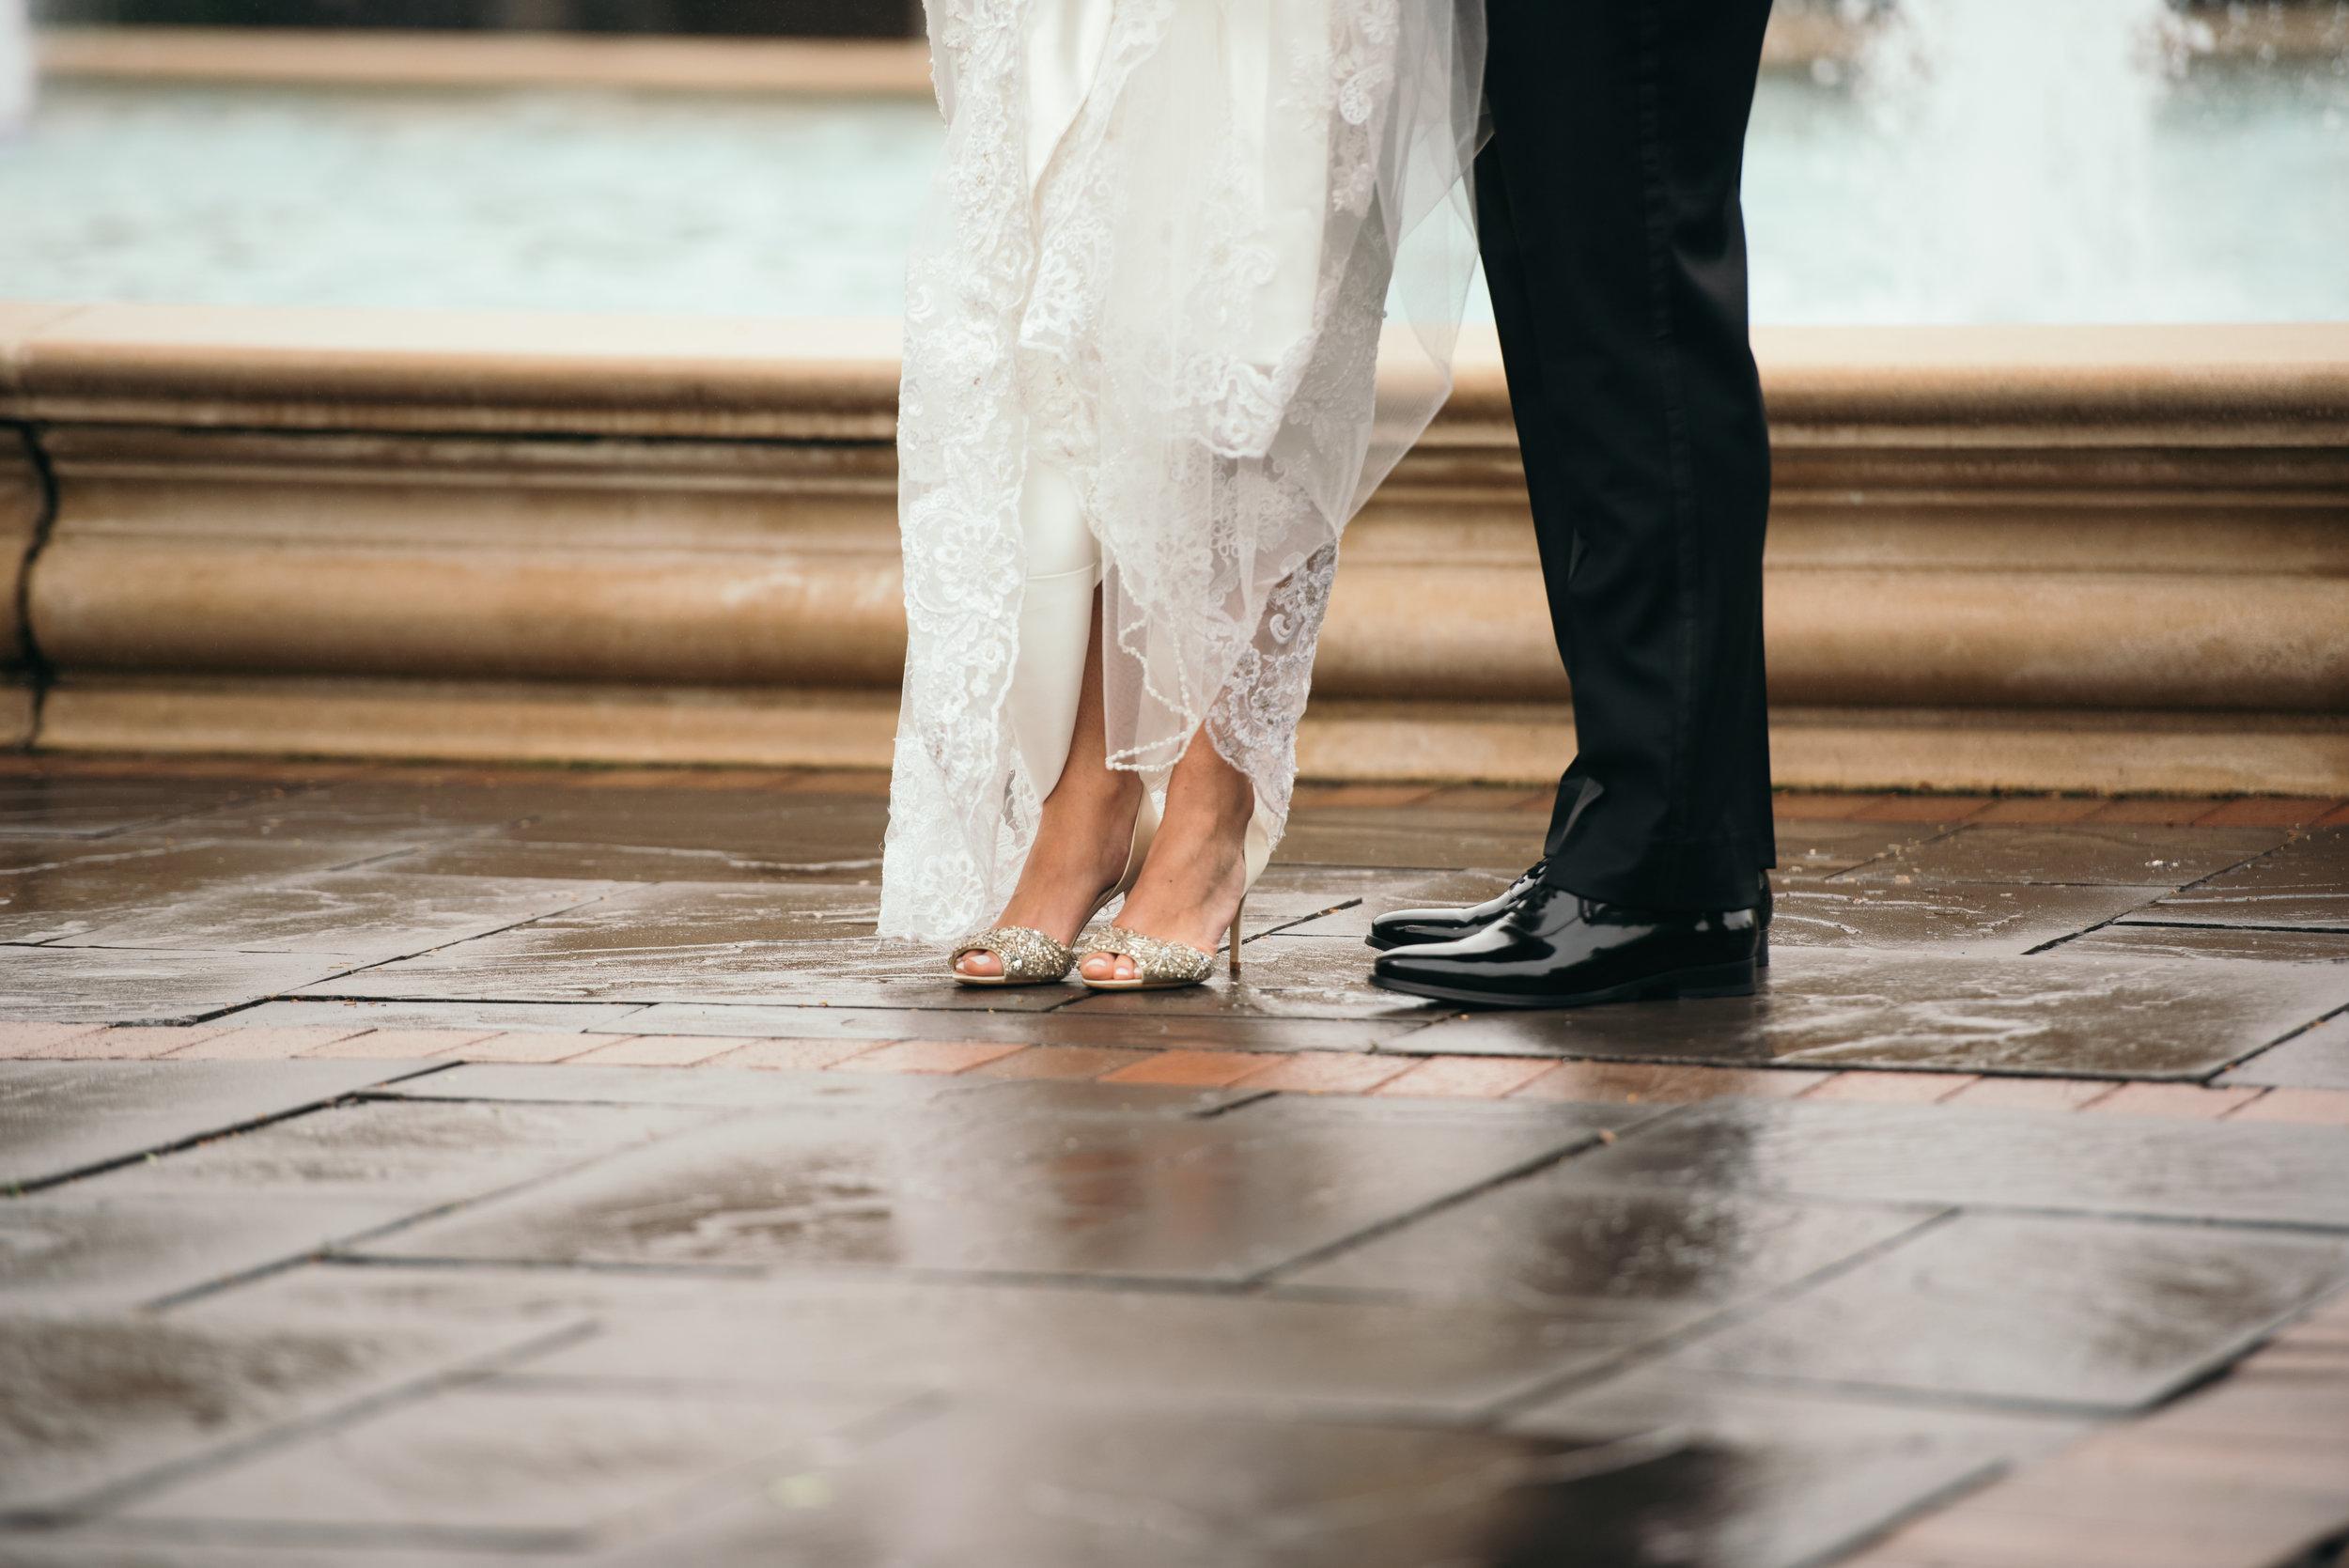 WeddingPhotos | NJPhotographer | Highlights-8-2.jpg